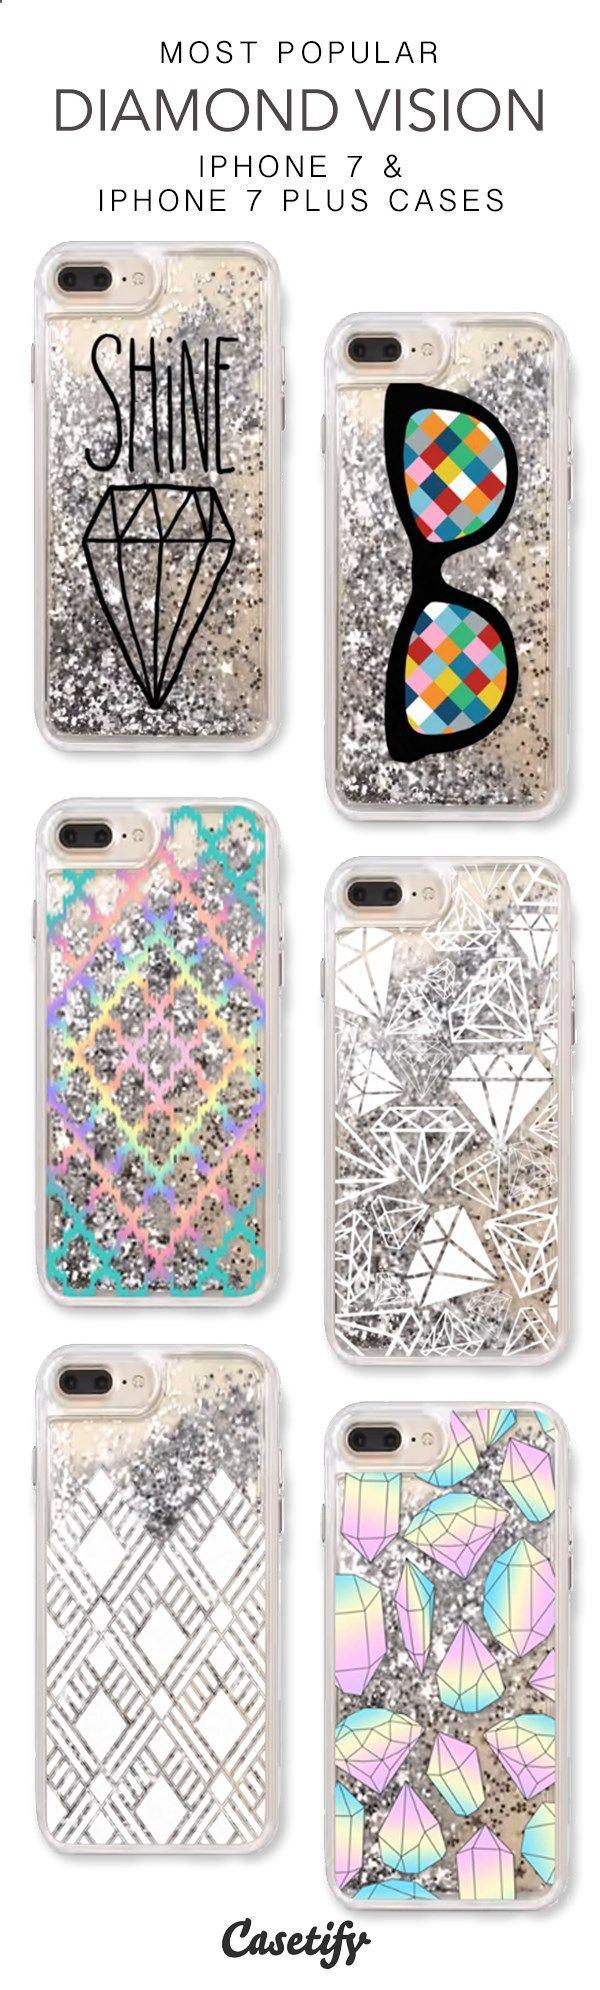 Phone Cases - Most Popular Diamond Vision iPhone 7 Cases & iPhone 7 Plus Cases. More liquid glitter iPhone case here > www.casetify.com/...